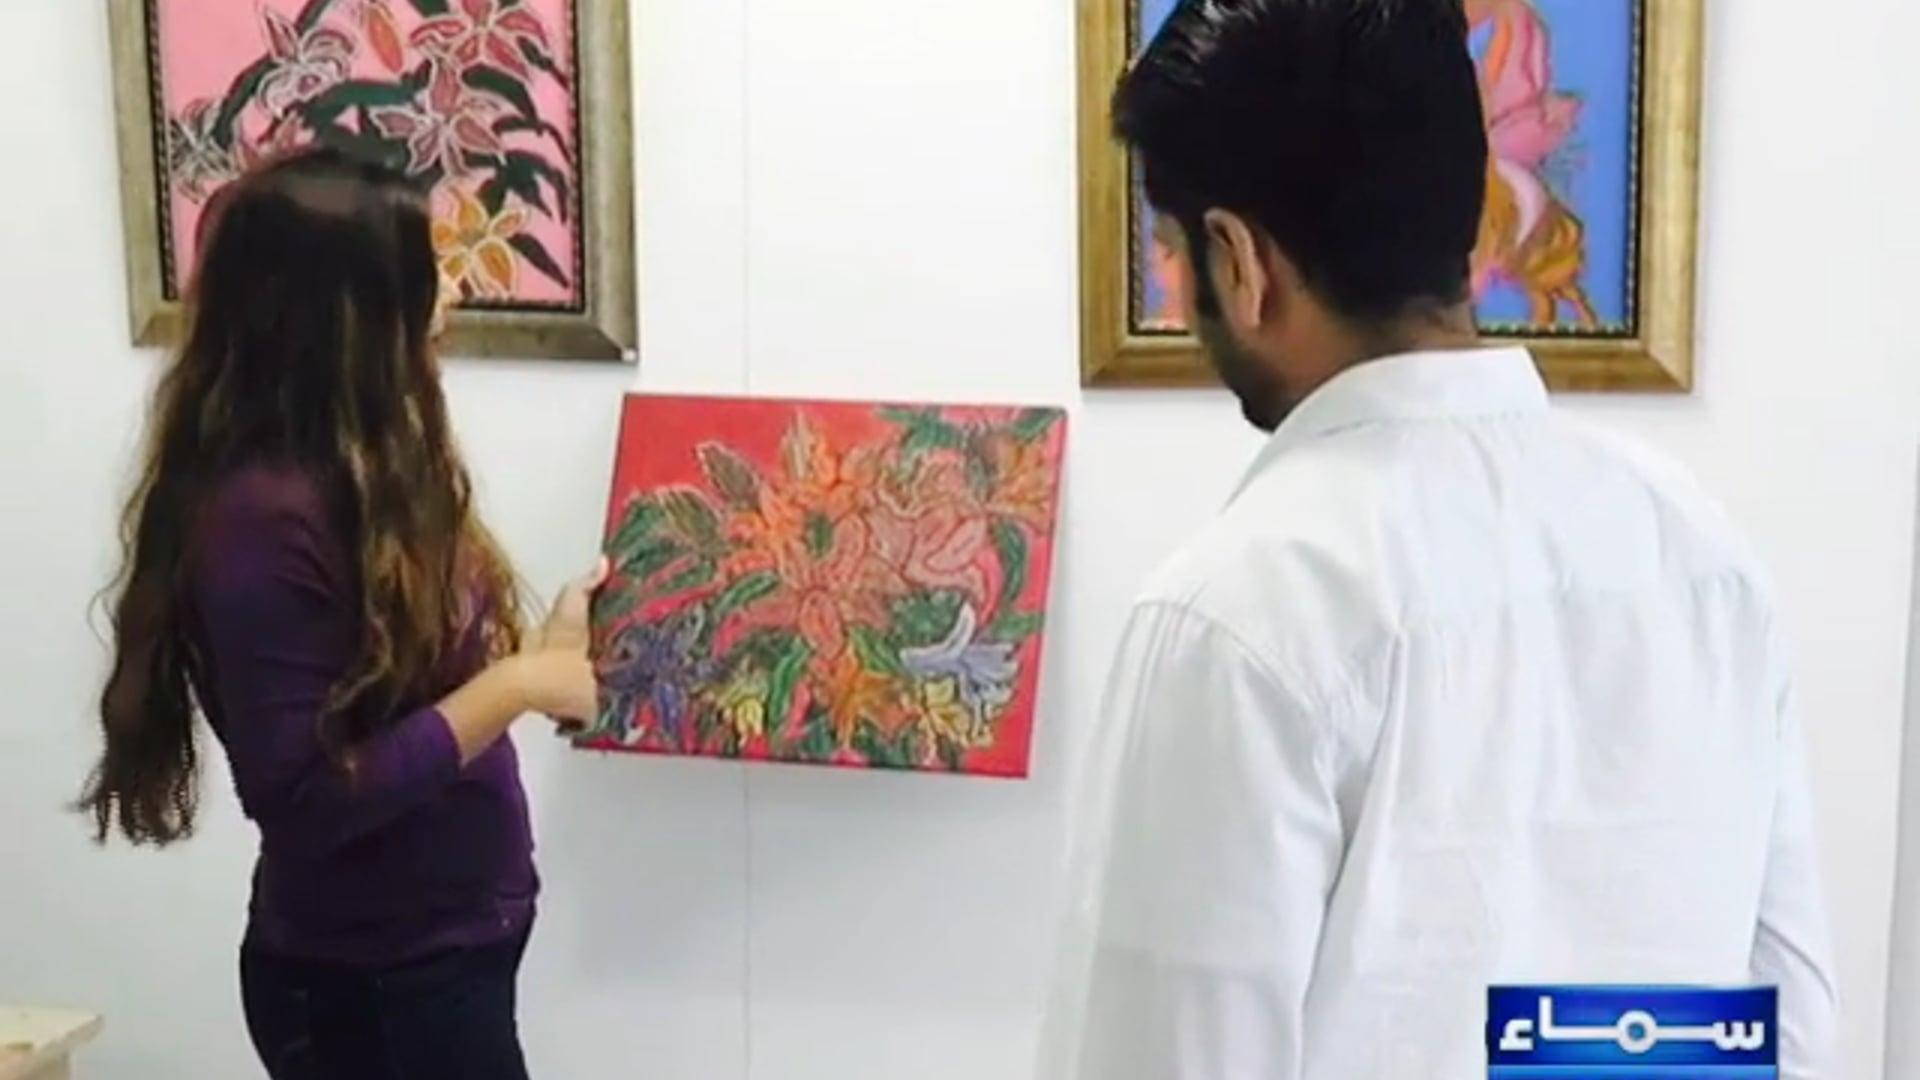 Artist Soraya Sikander on her work (SAMAA TV)